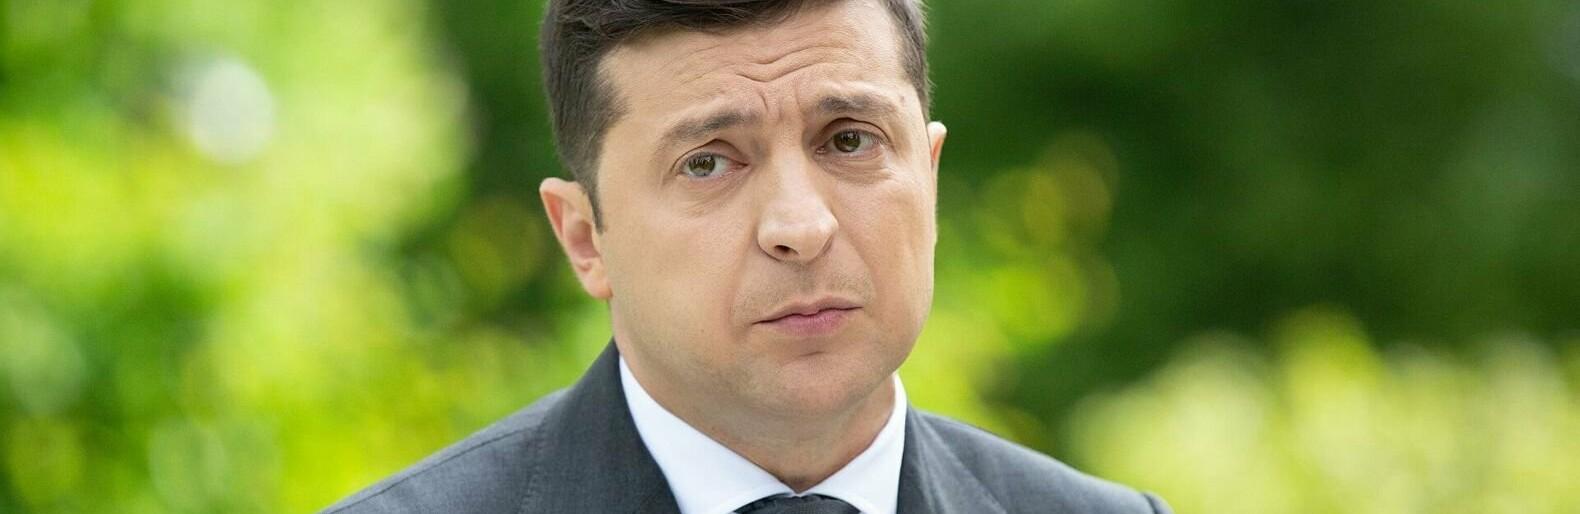 Одесситы недружелюбно встретили Президента Зеленского  , - ФОТО, ВИДЕО0